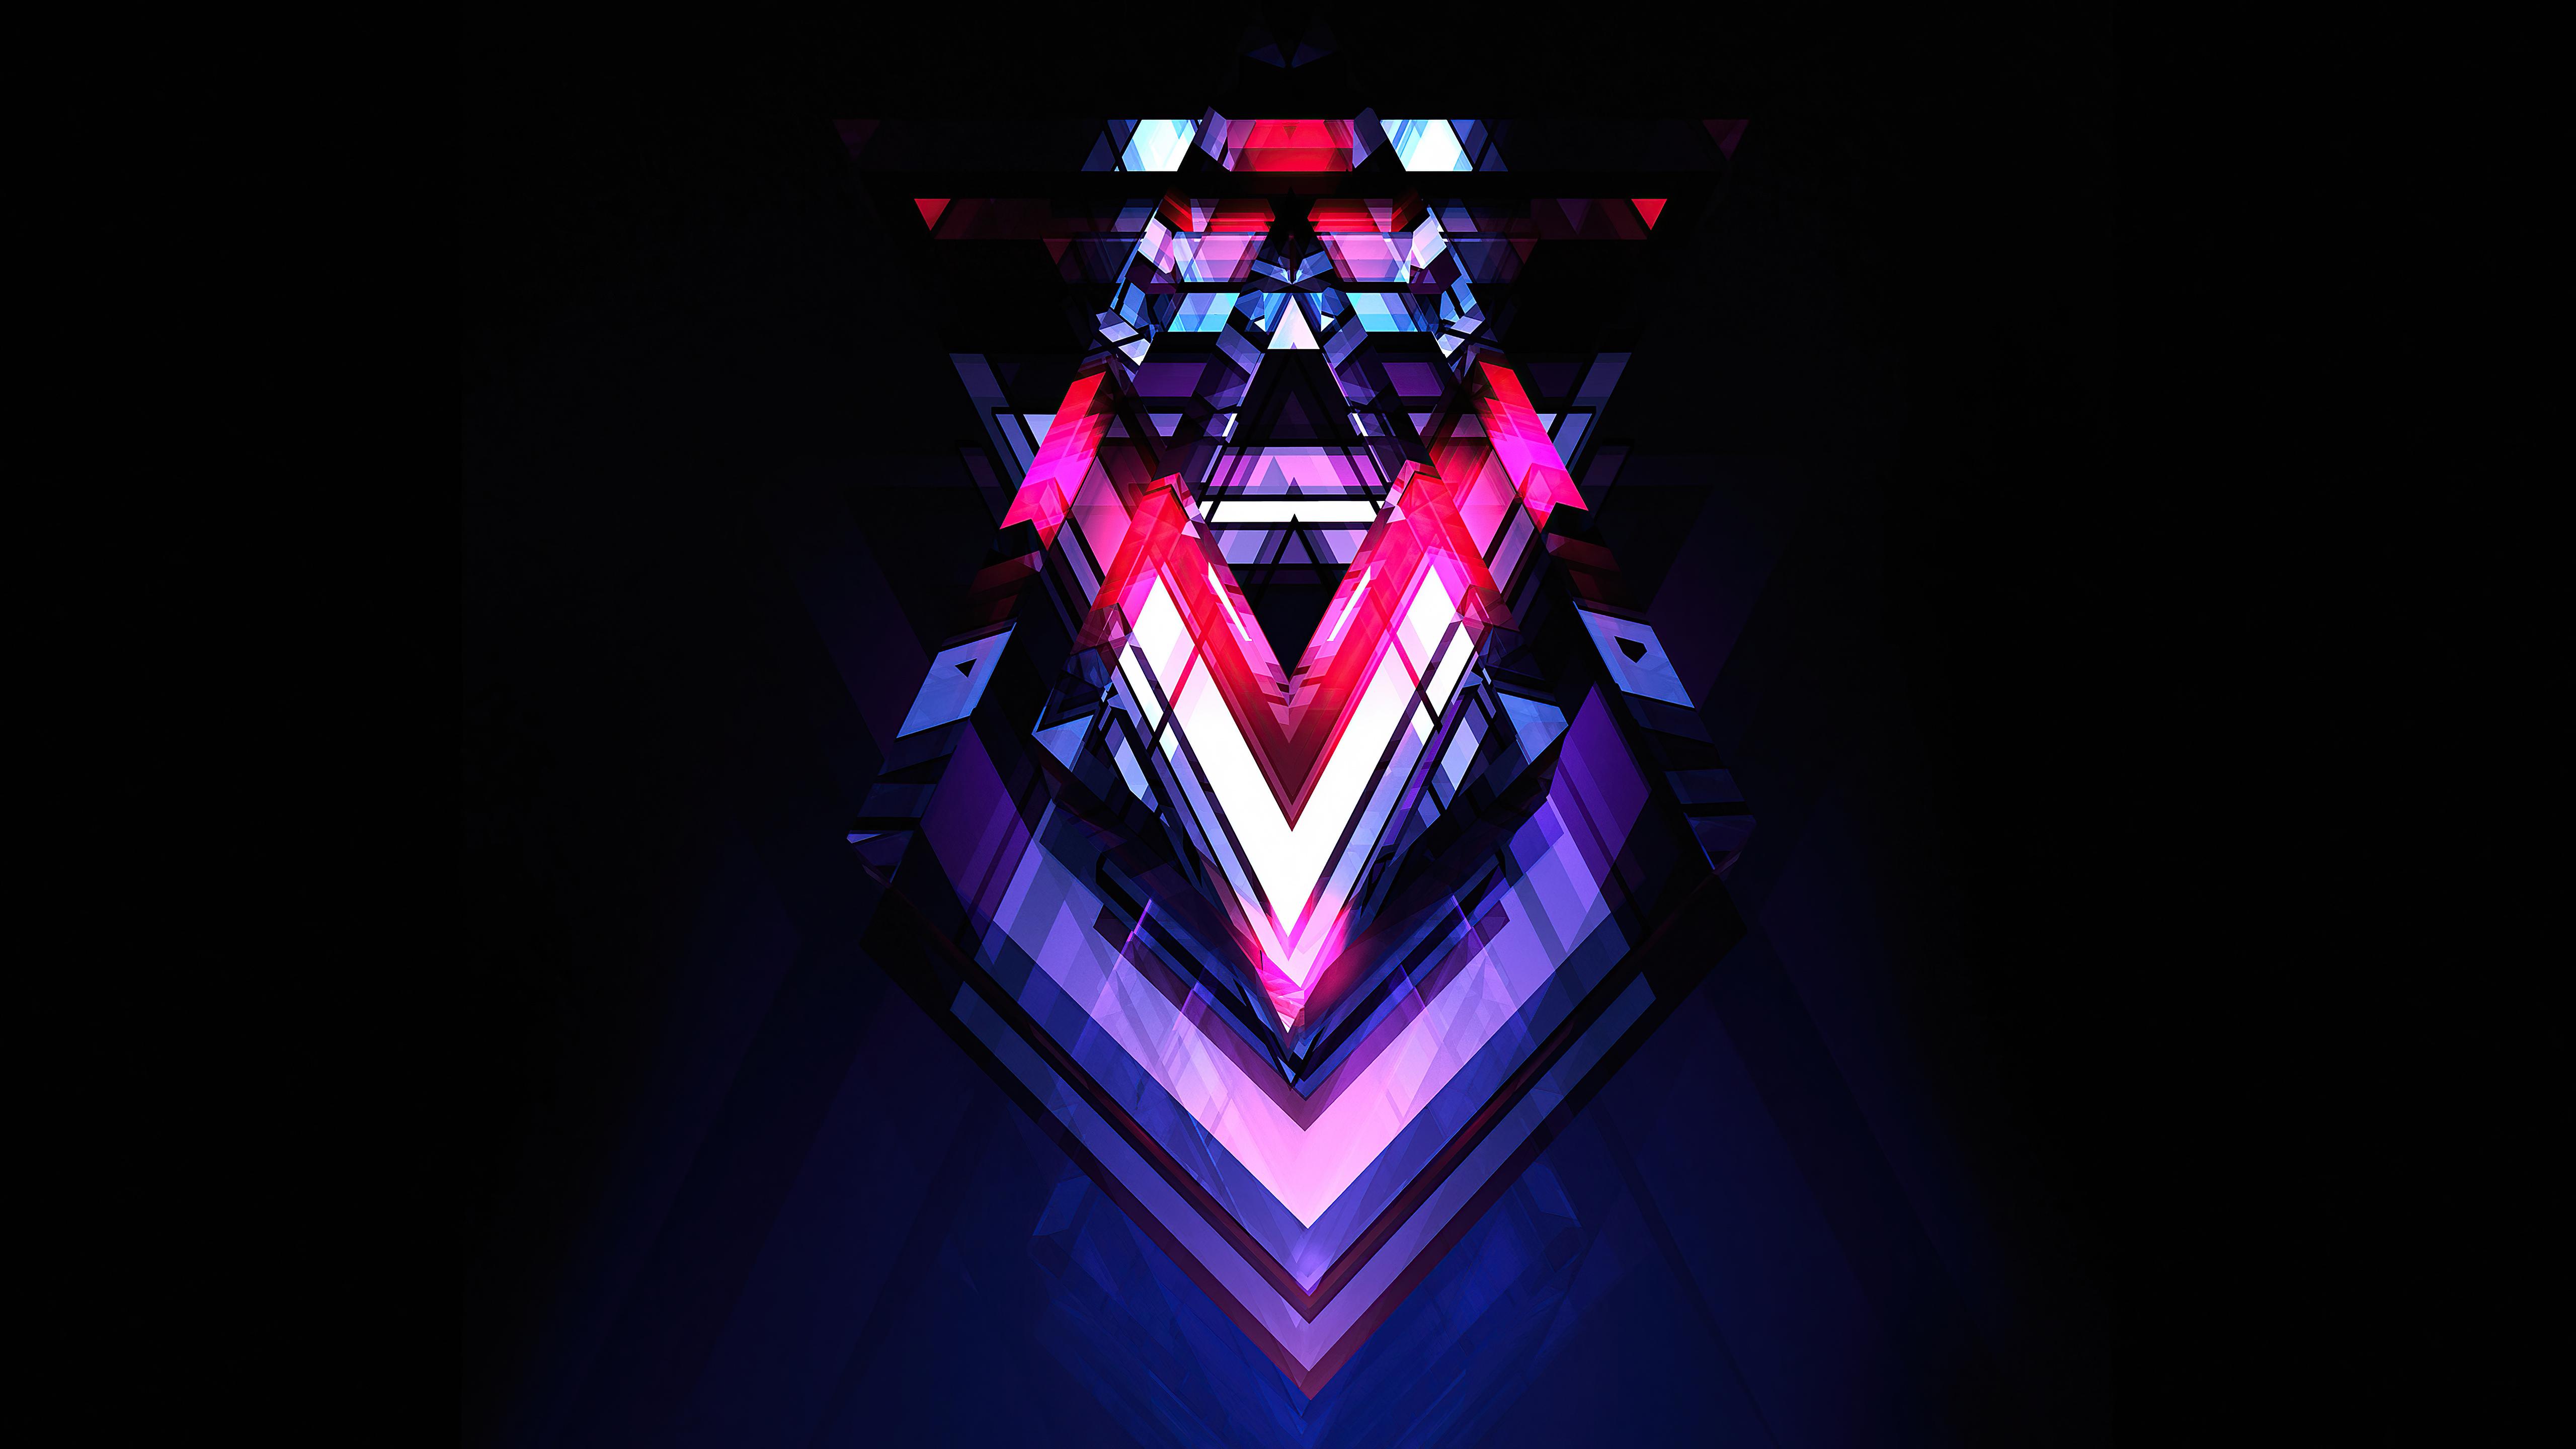 v diagonal abstract 4k 1620164317 - V Diagonal Abstract 4k - V Diagonal Abstract 4k wallpapers